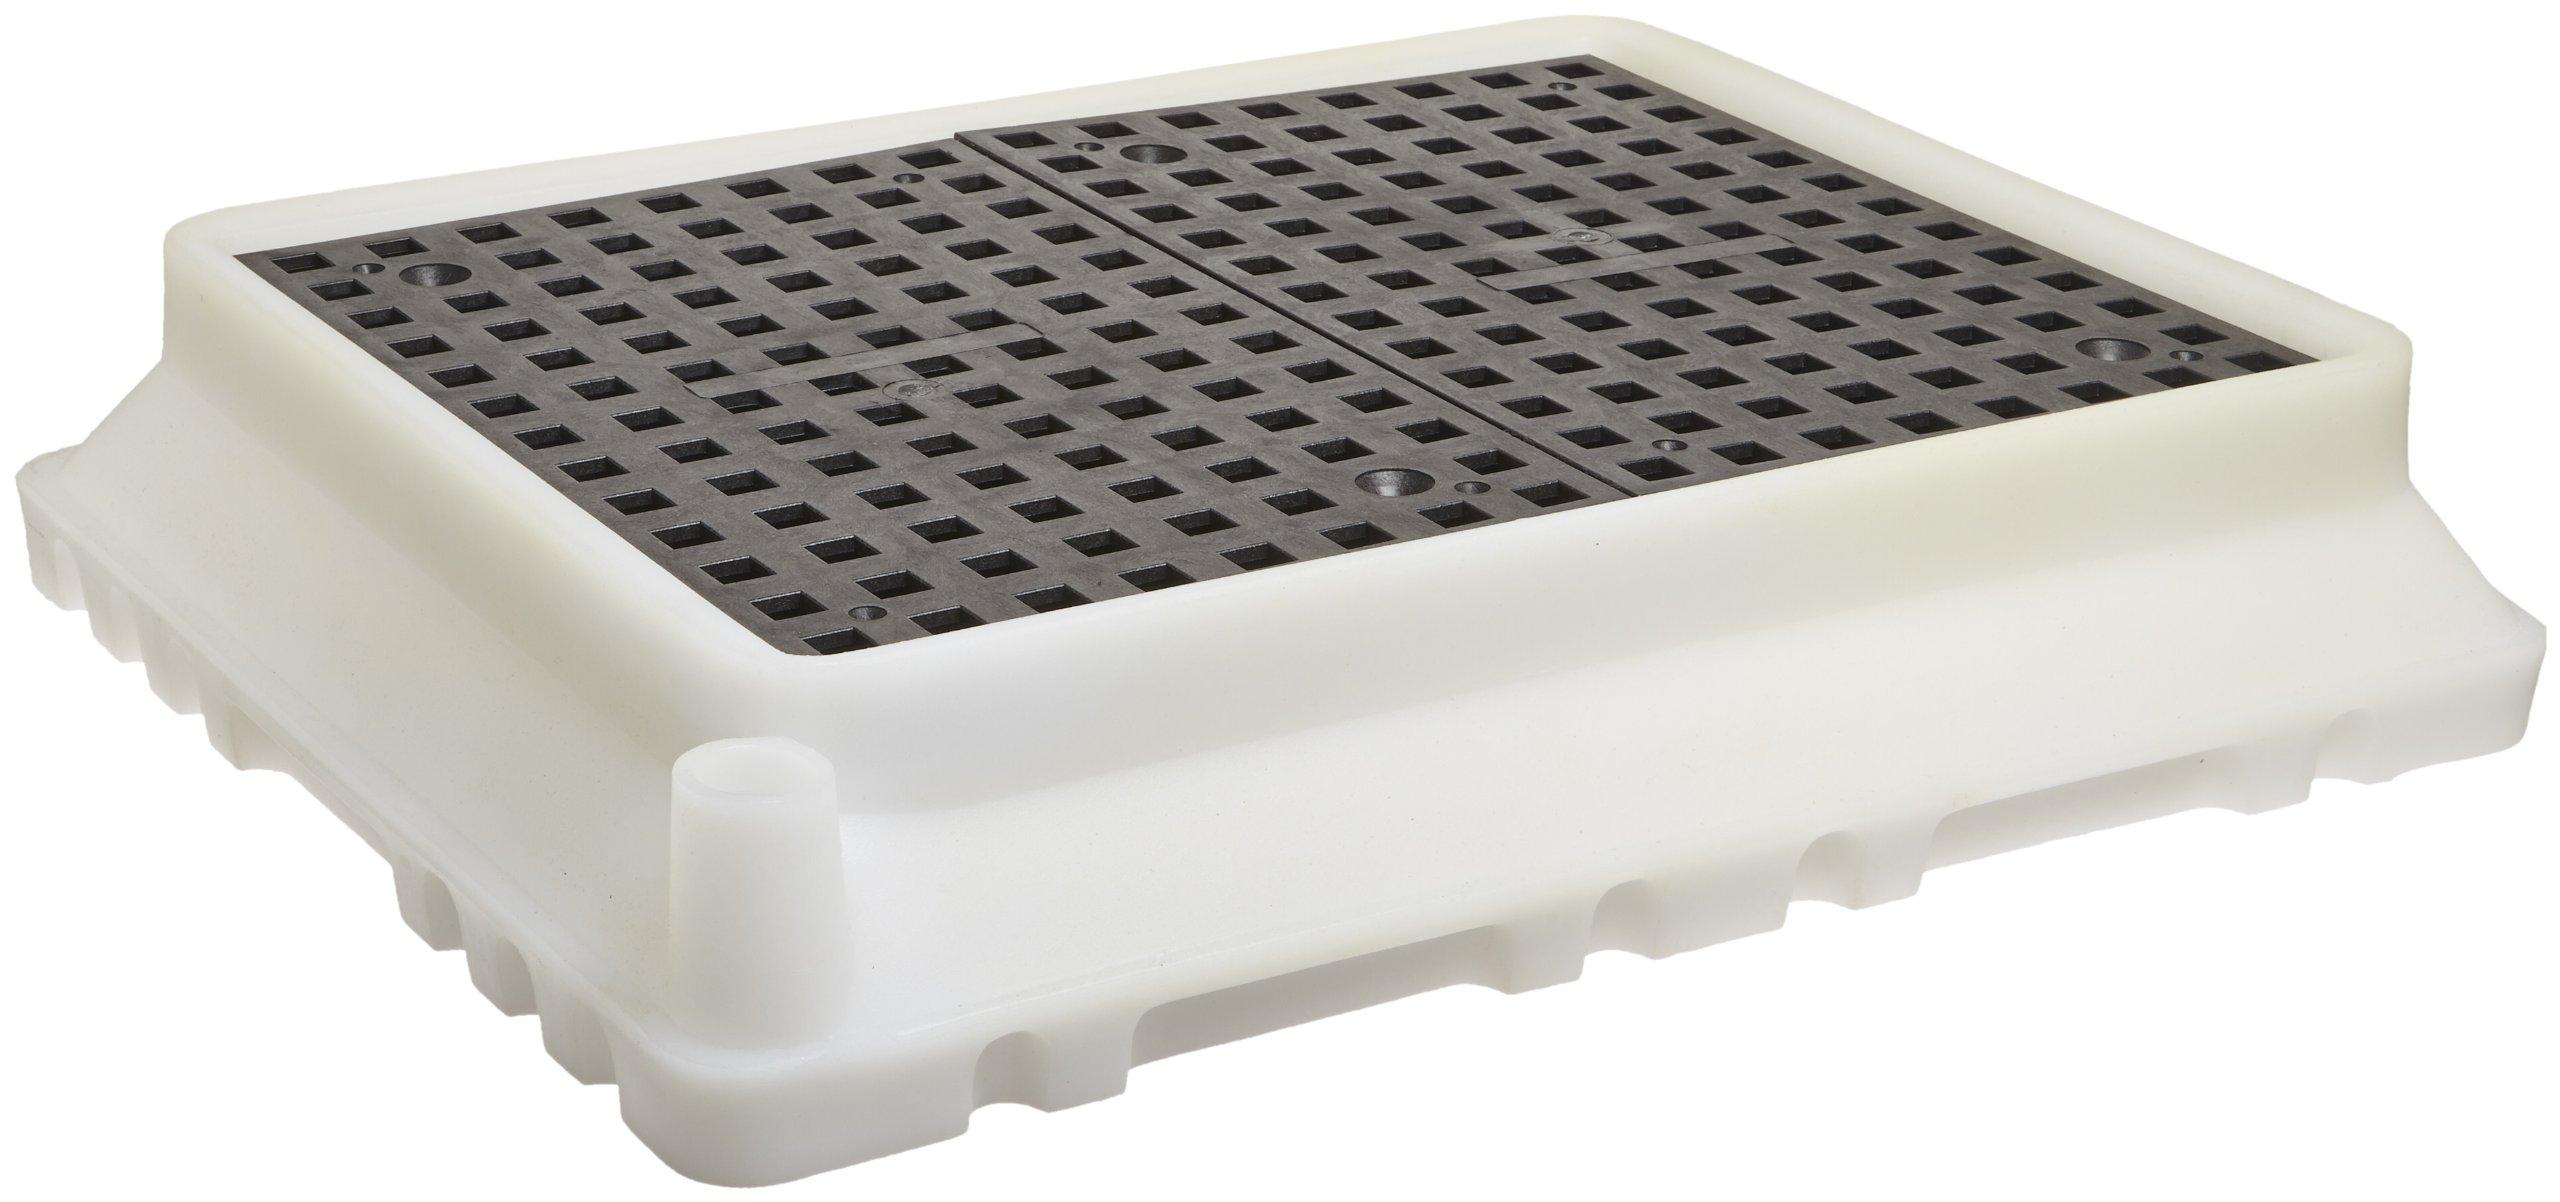 UltraTech 1061 Polyethylene Ultra-Spill Tray P4, 2.9 Gallon Capacity, 5 Year Warranty, White